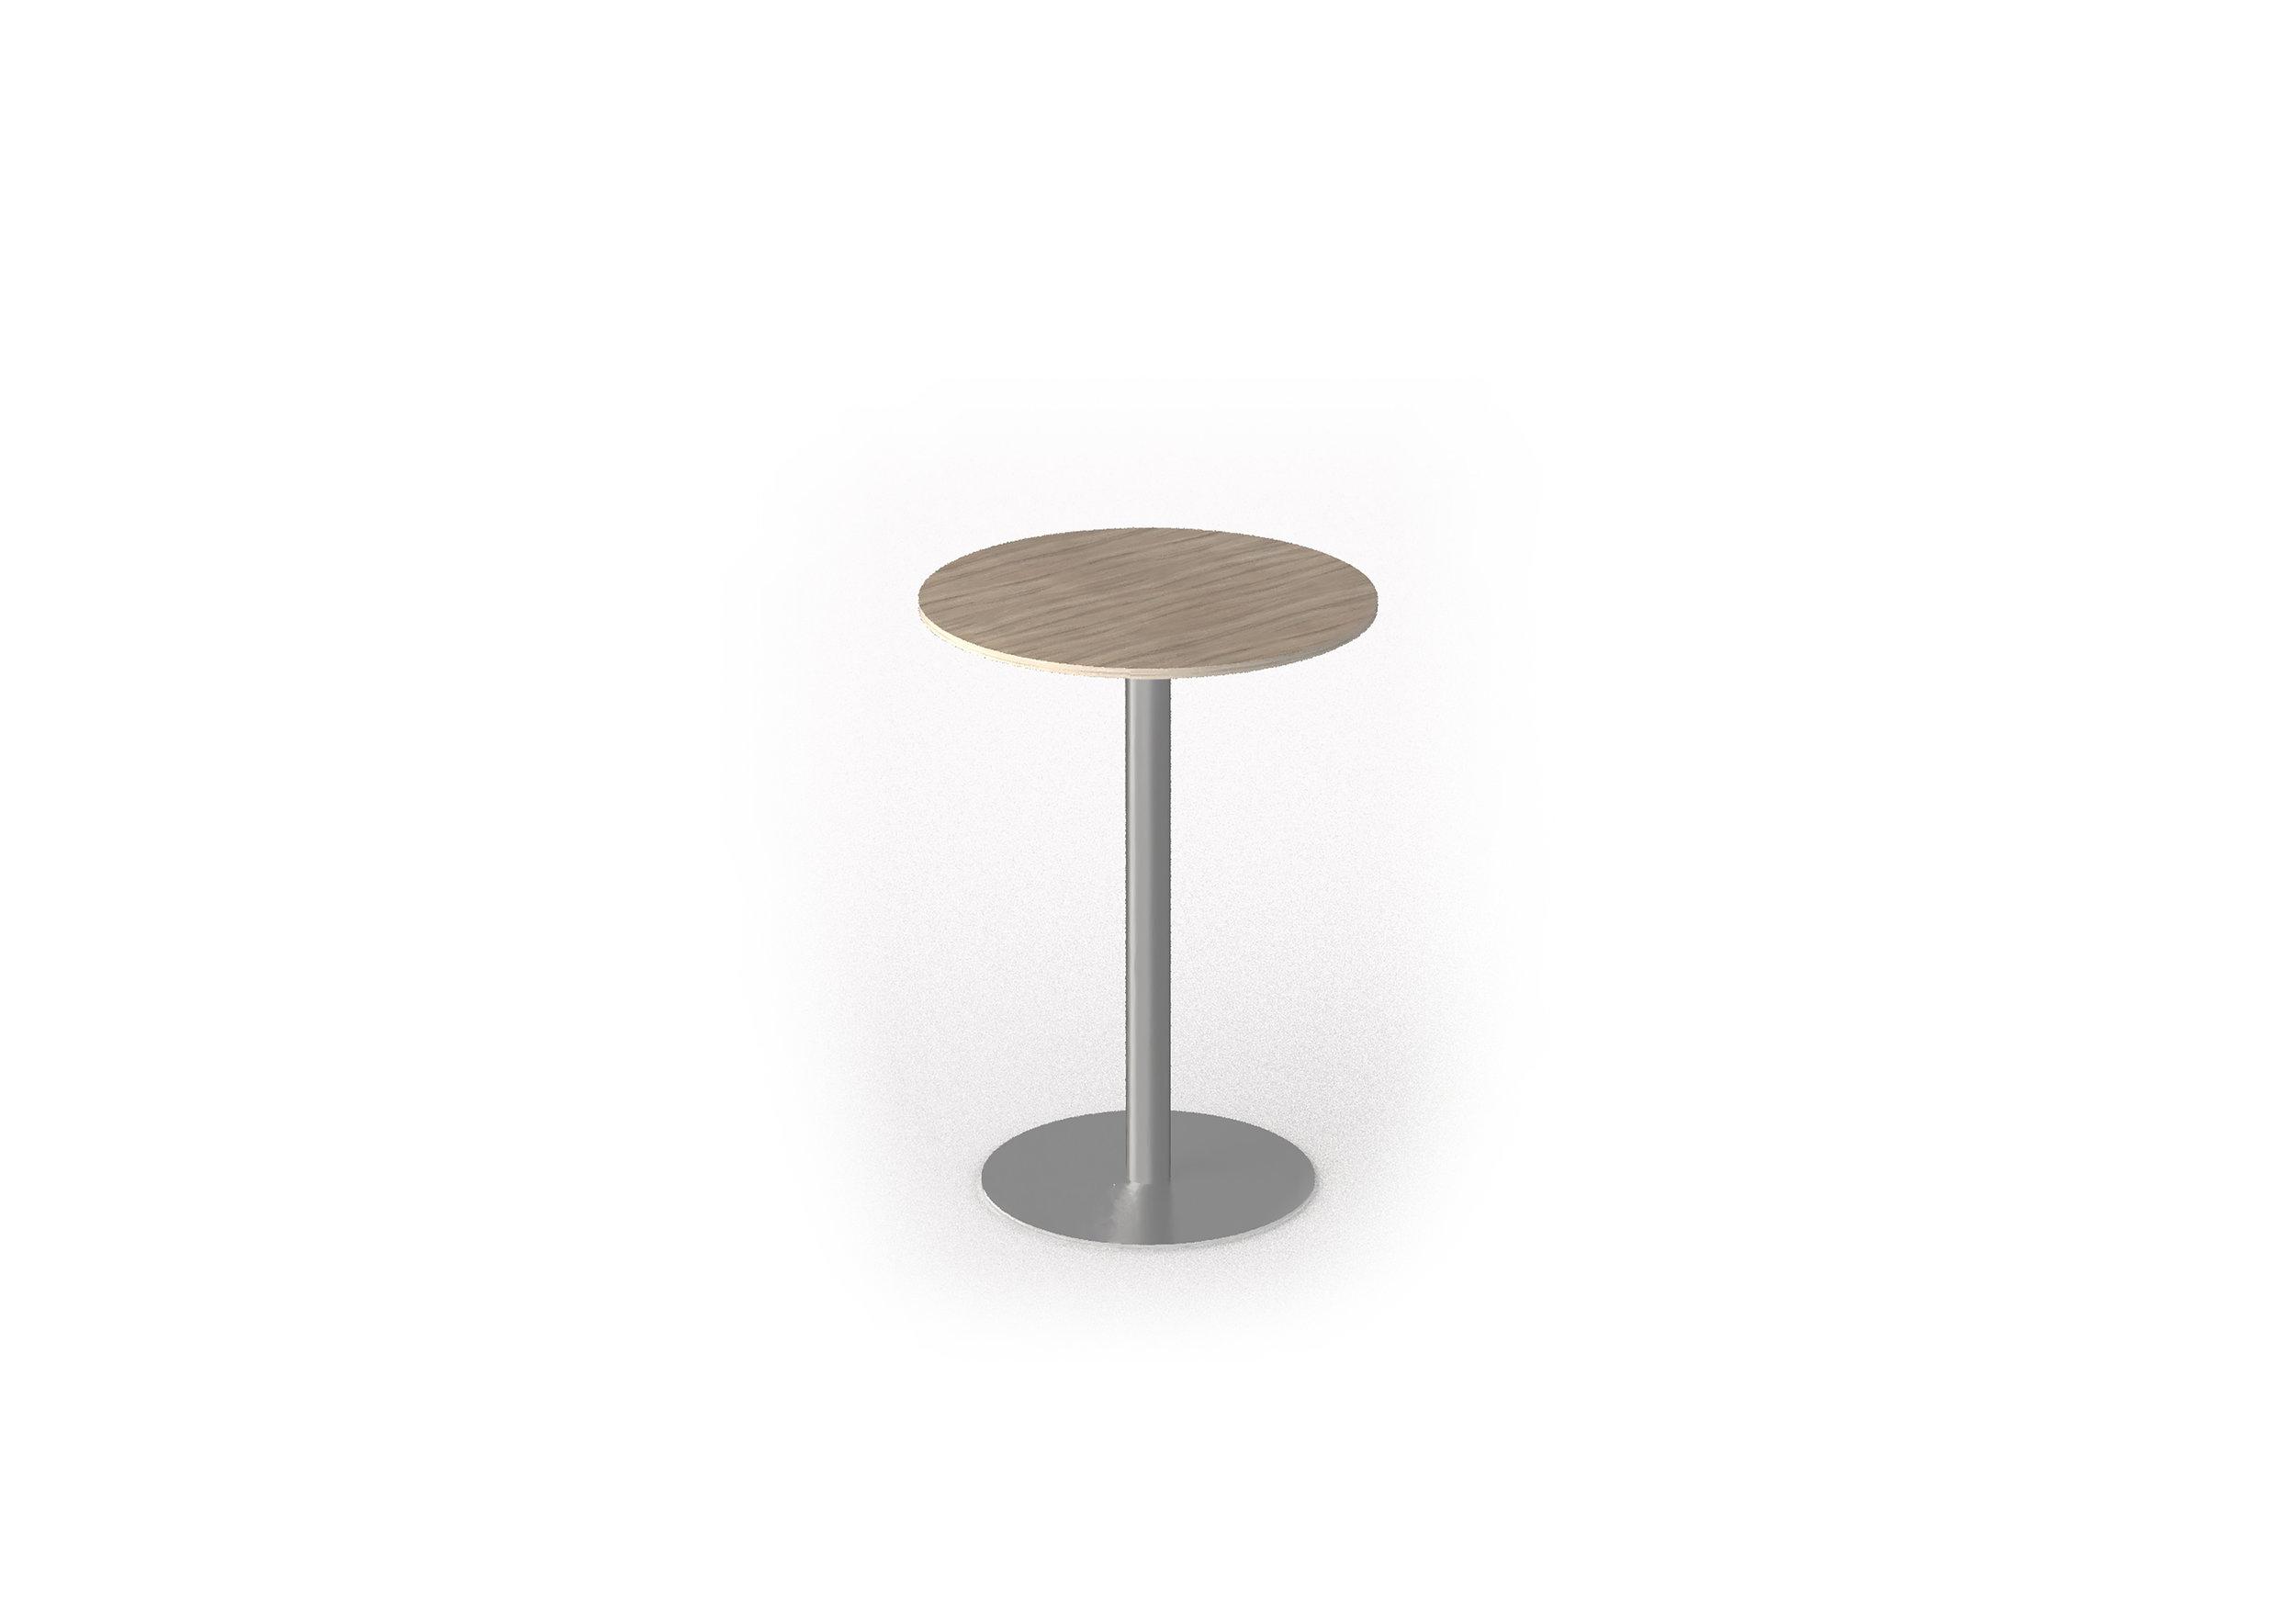 column_table_round_high_CT-HTR-080-0-0.jpg